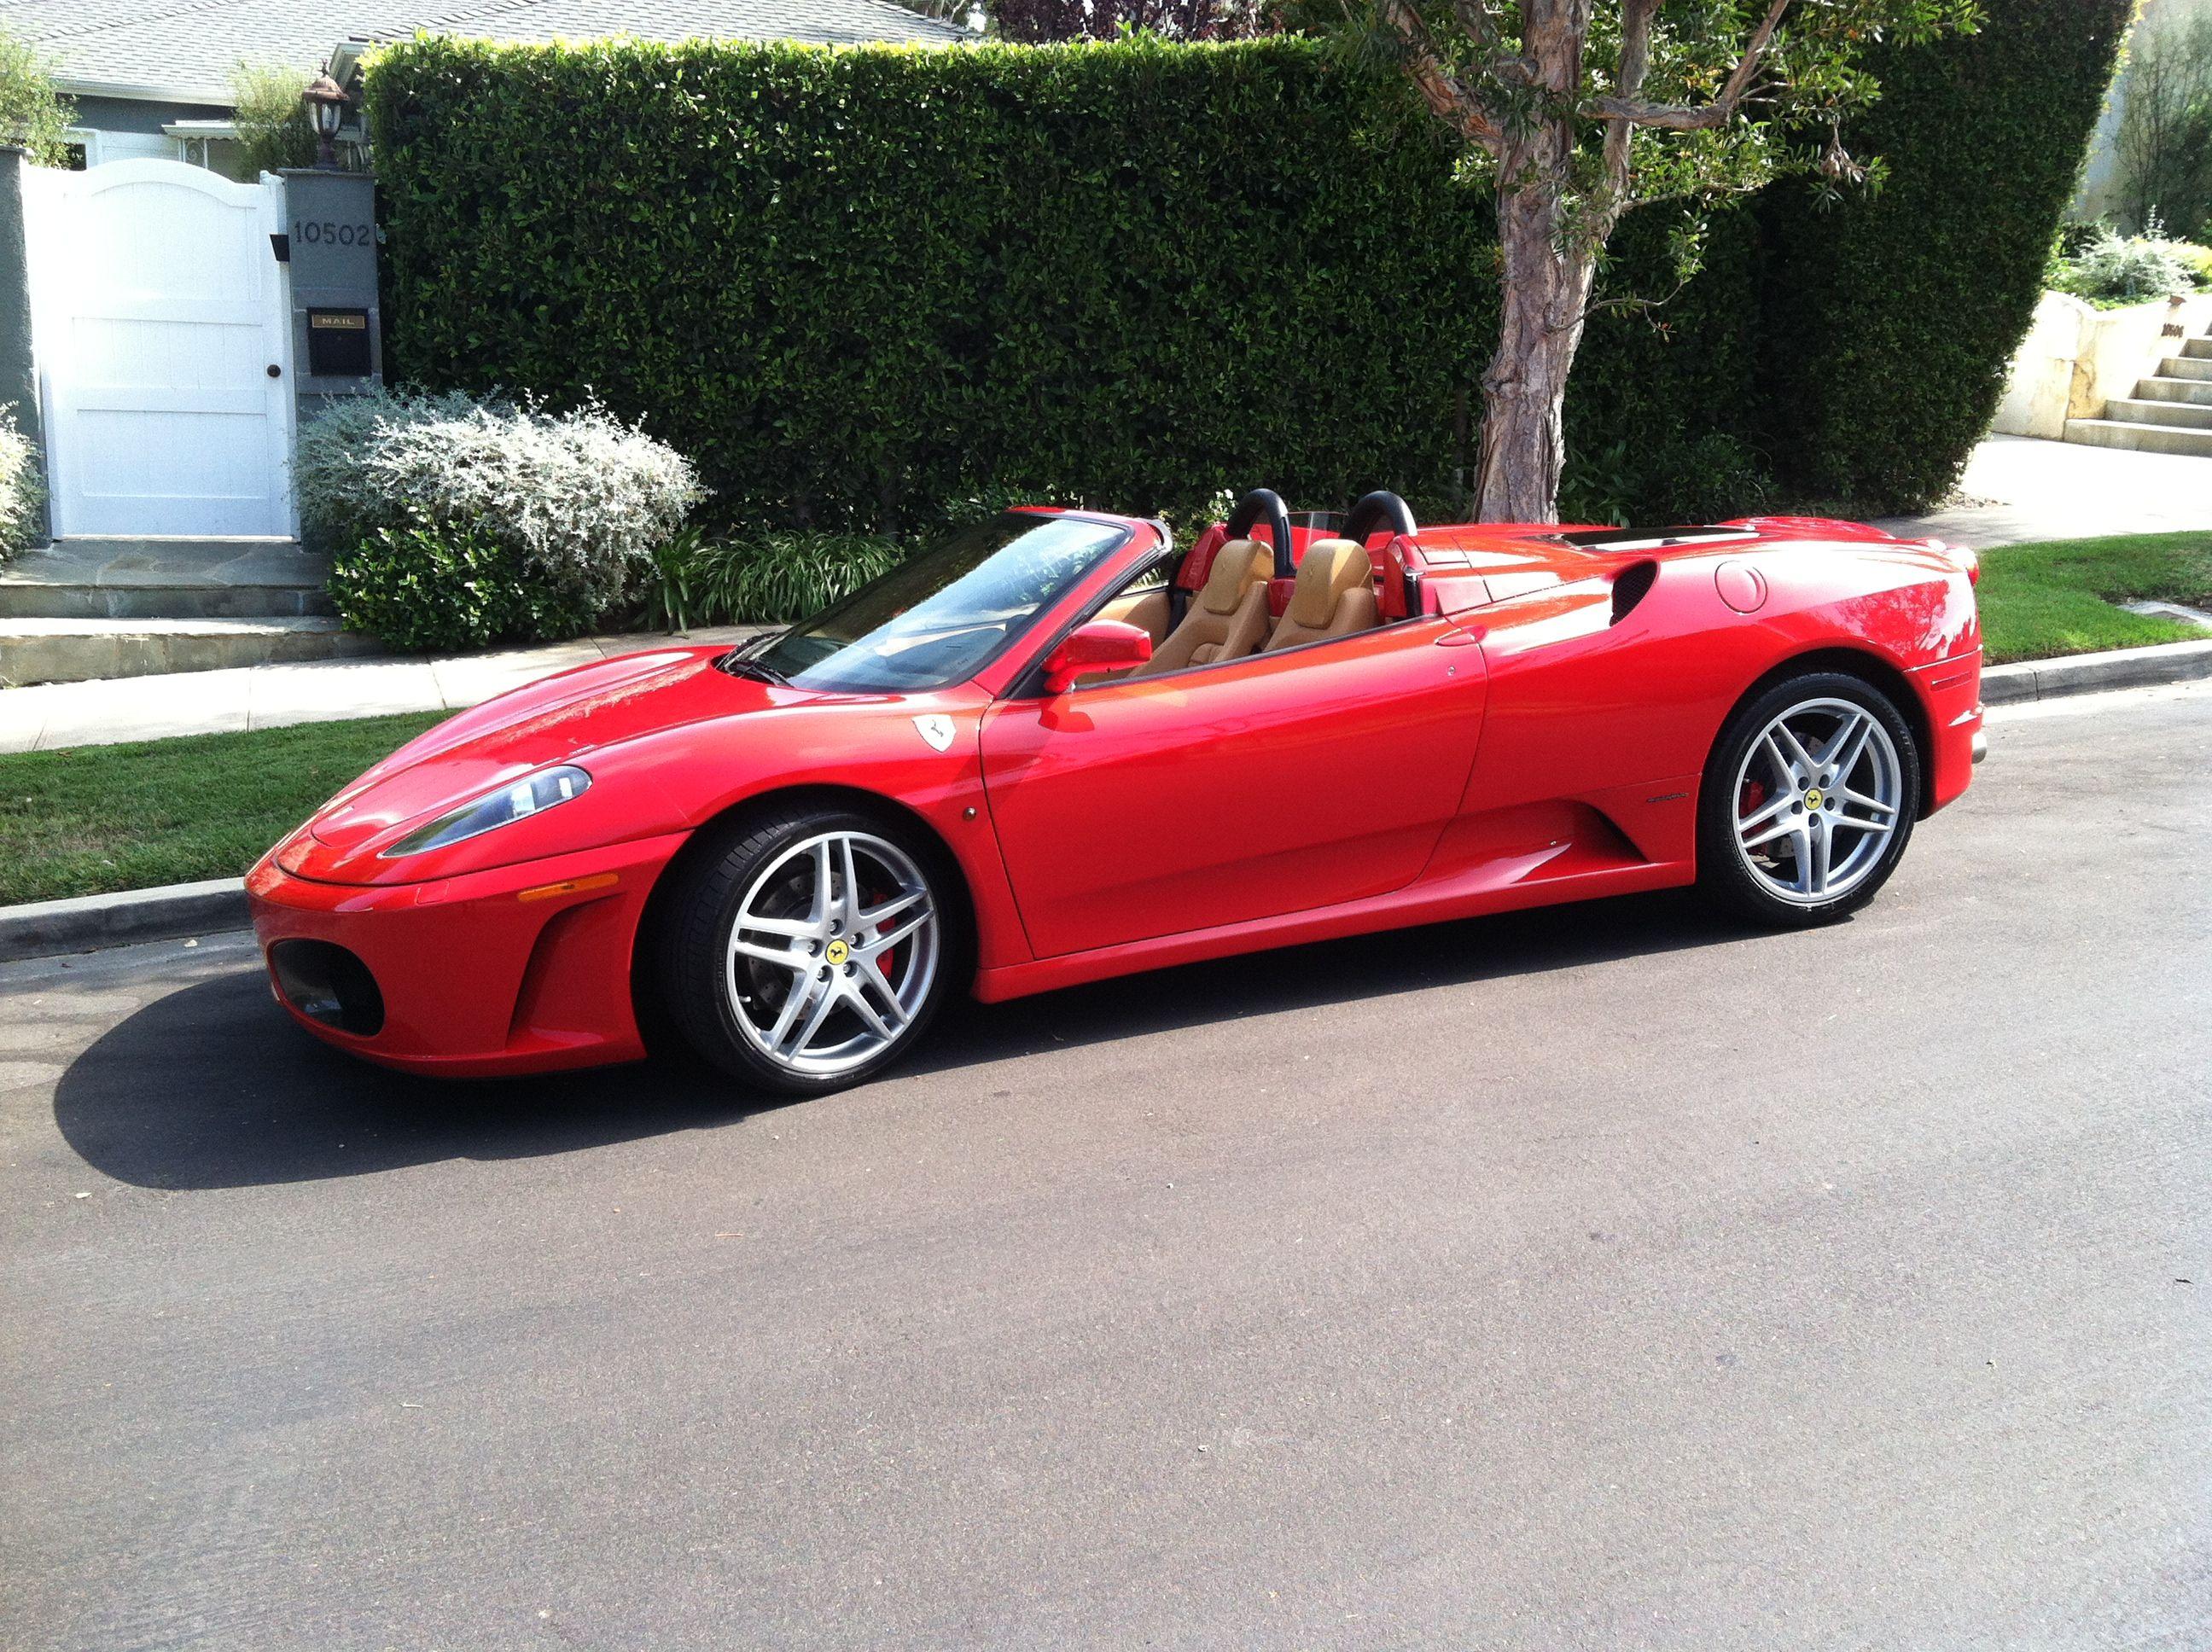 apeximage lifestyles rental las vegas luxury rent in lamborghini apex a services car and